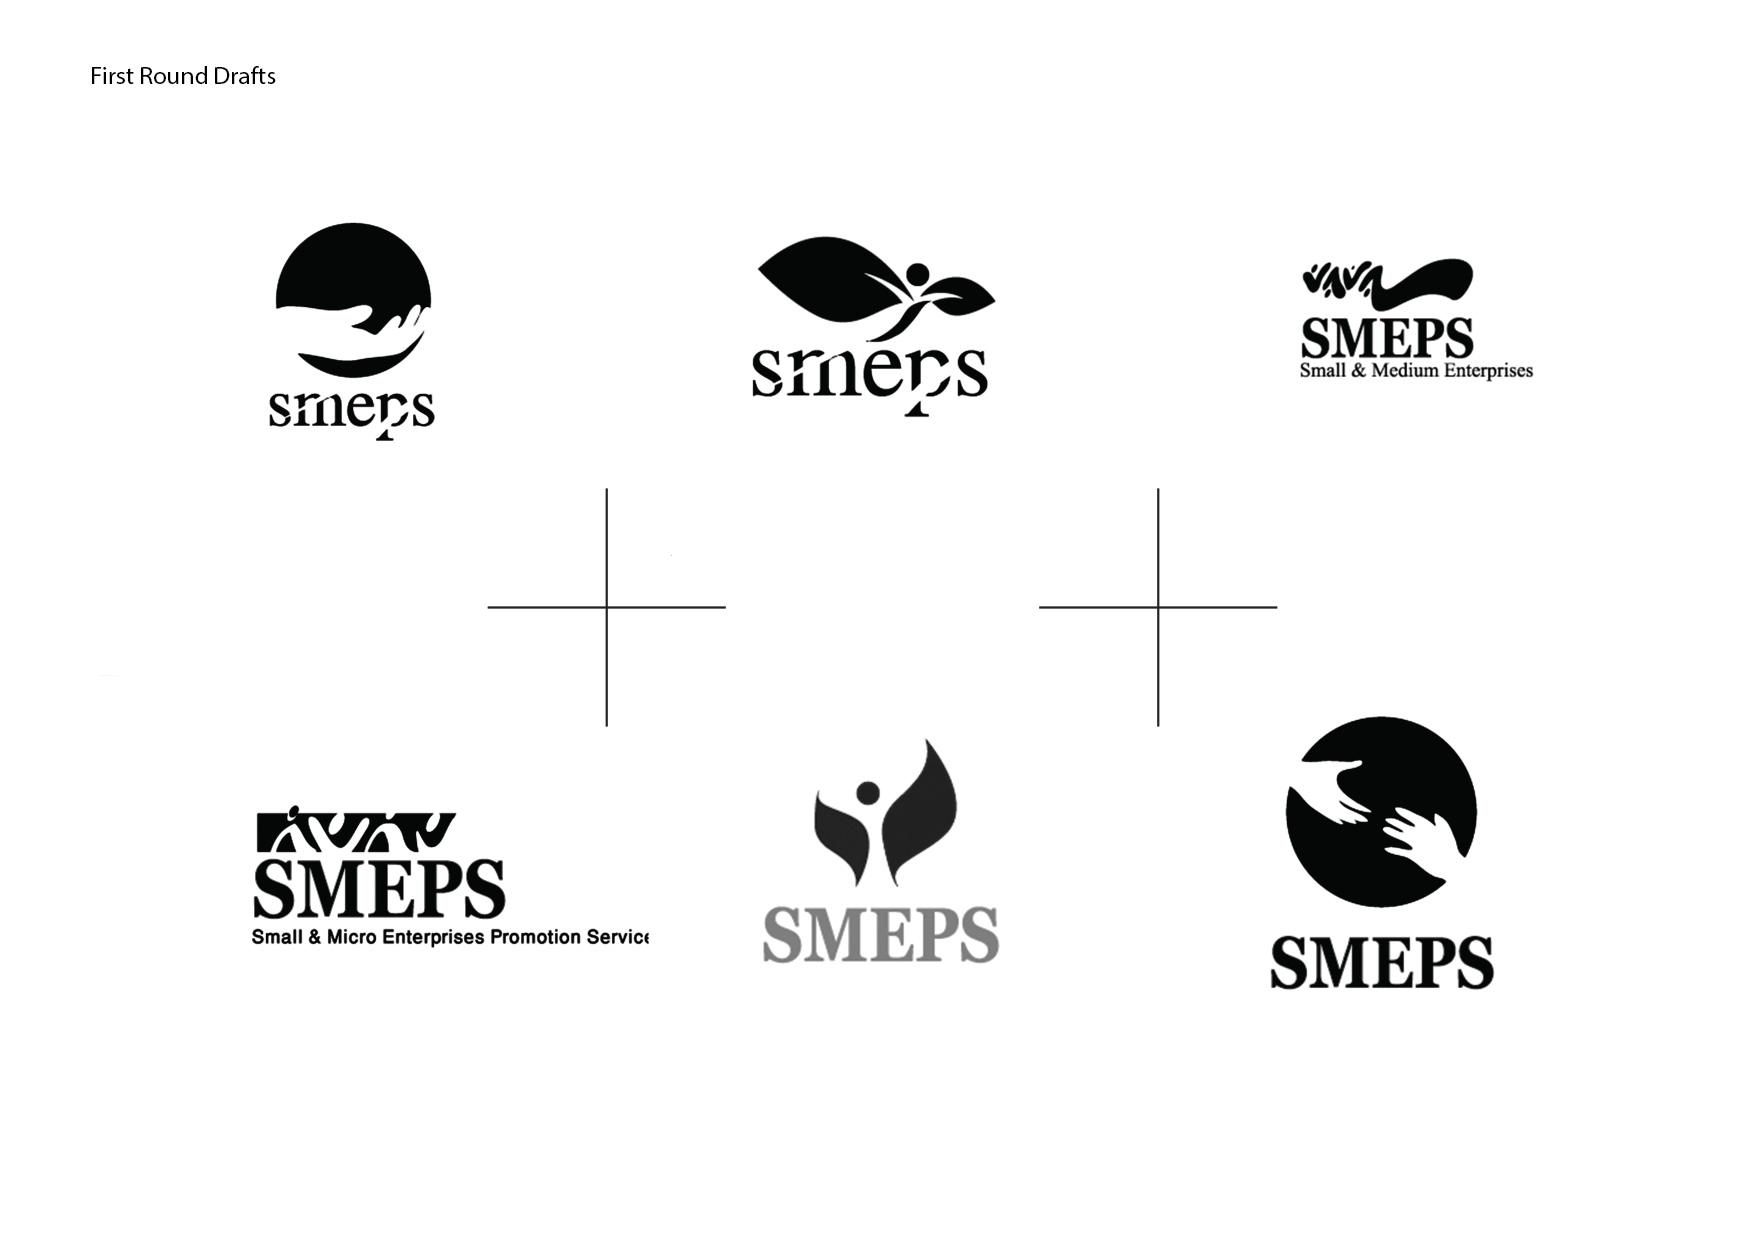 smeps_identity-07